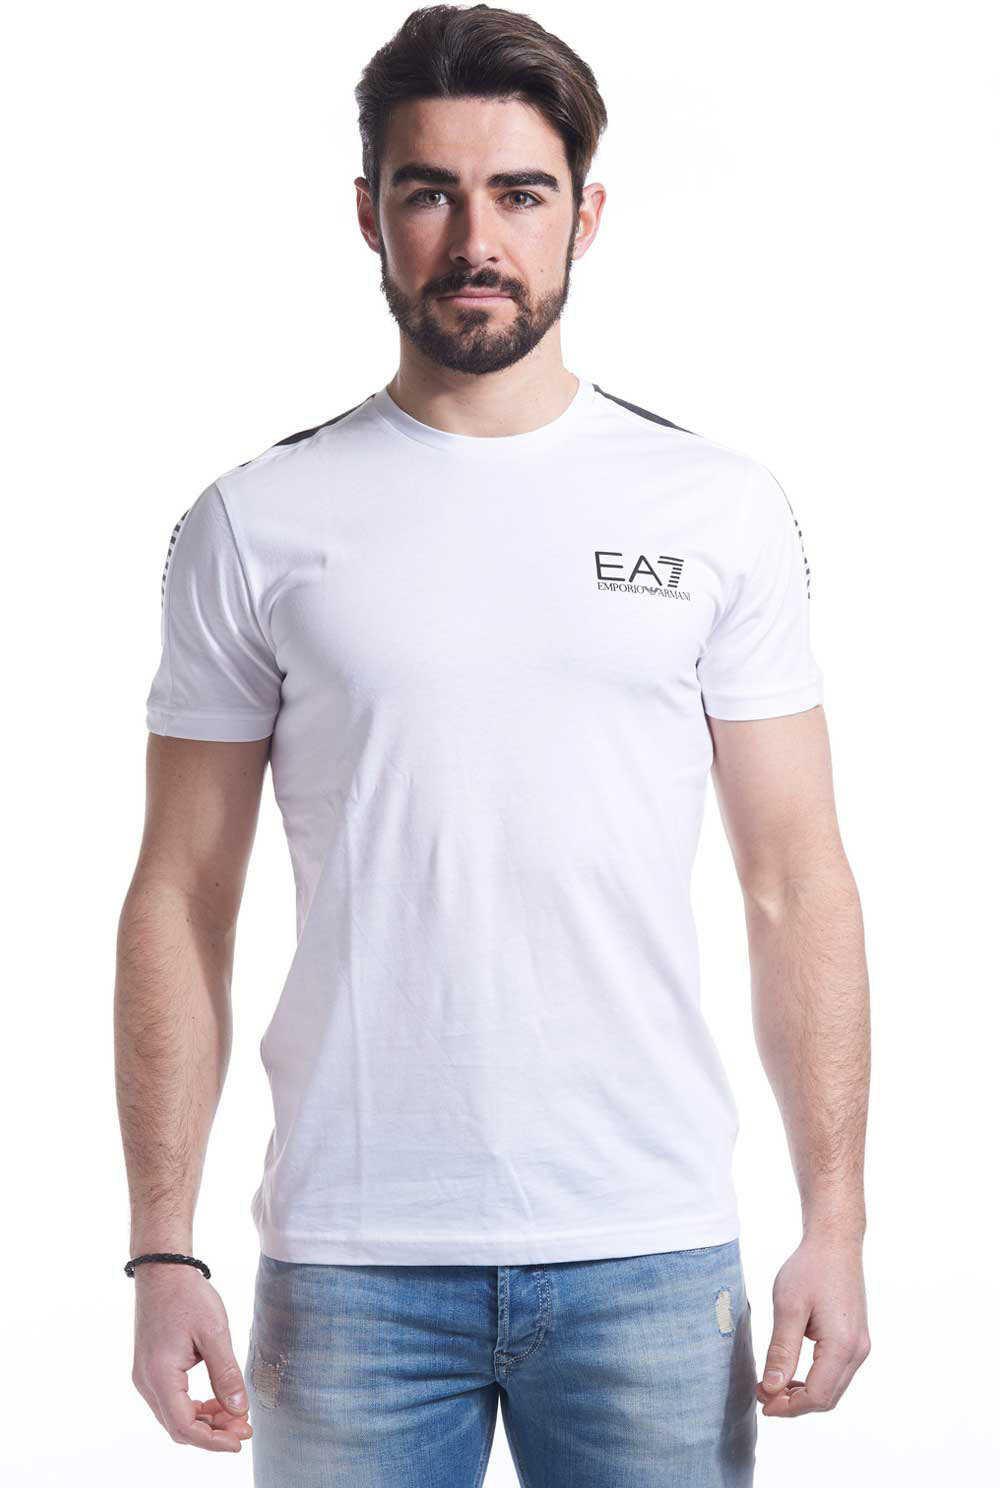 EA7 D0561850 White